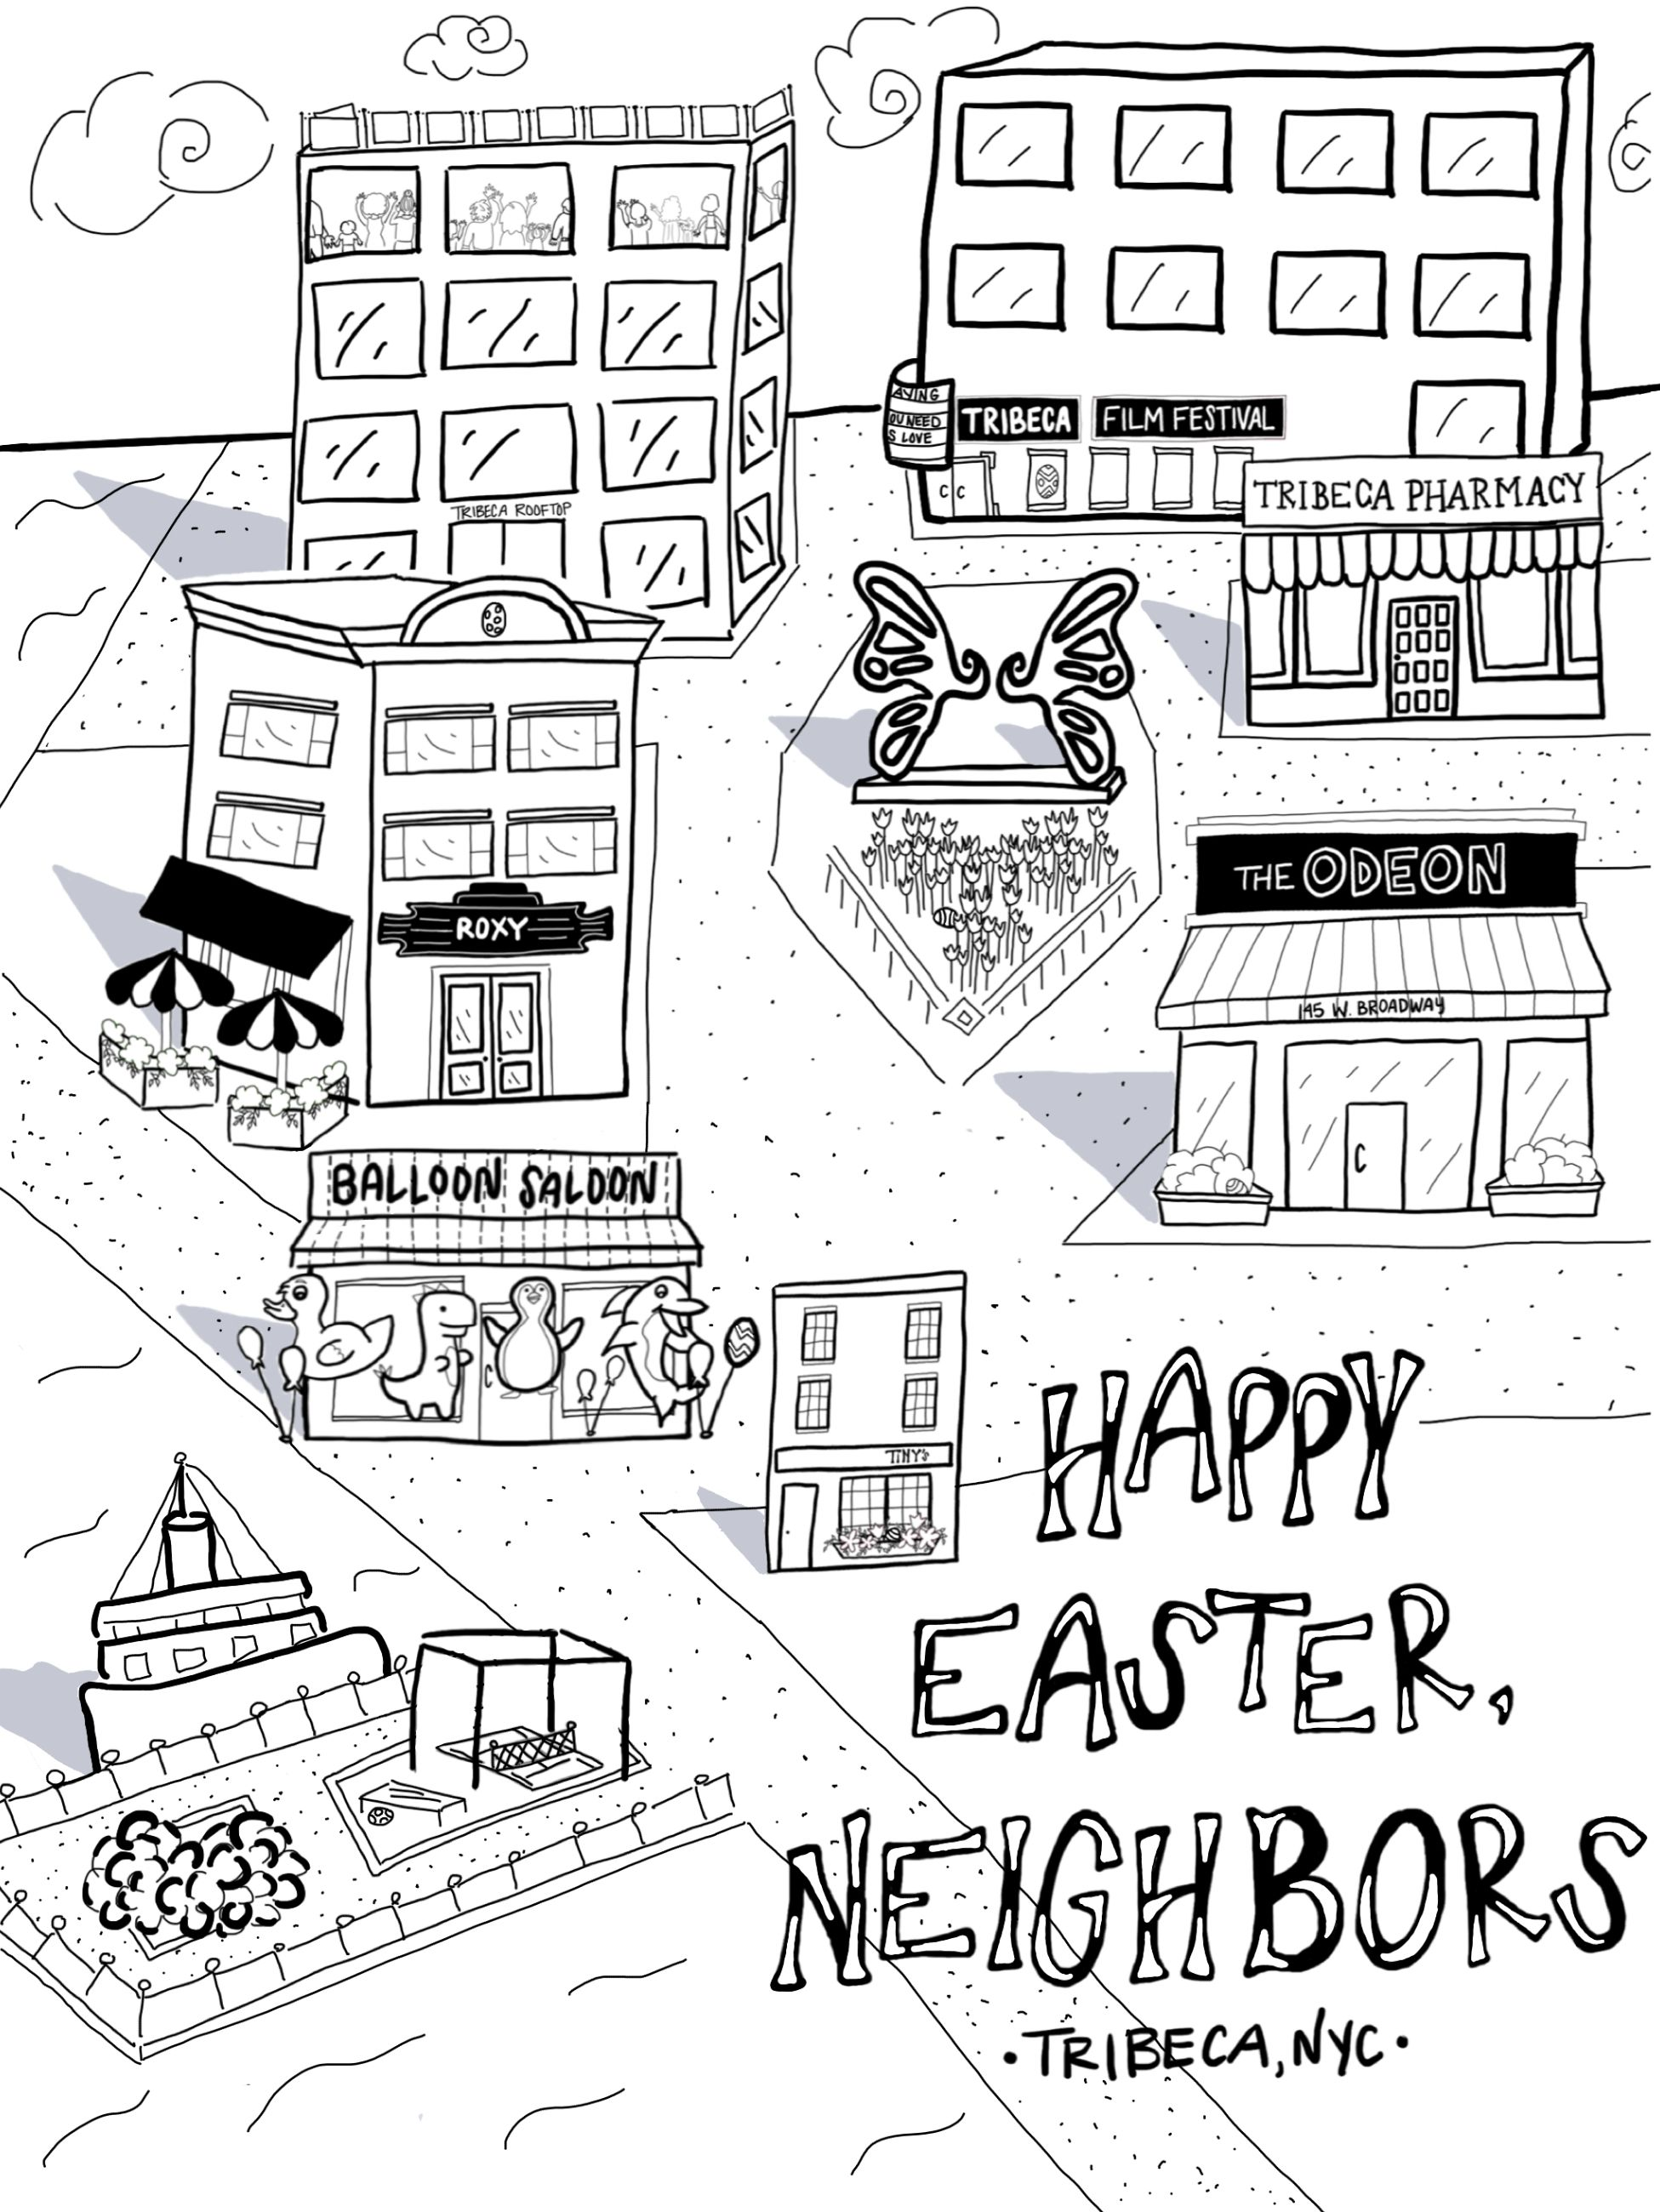 Neighborhood Easter Egg Hunt Coloring Page Coloring Pages Easter Egg Hunt Game Inspiration